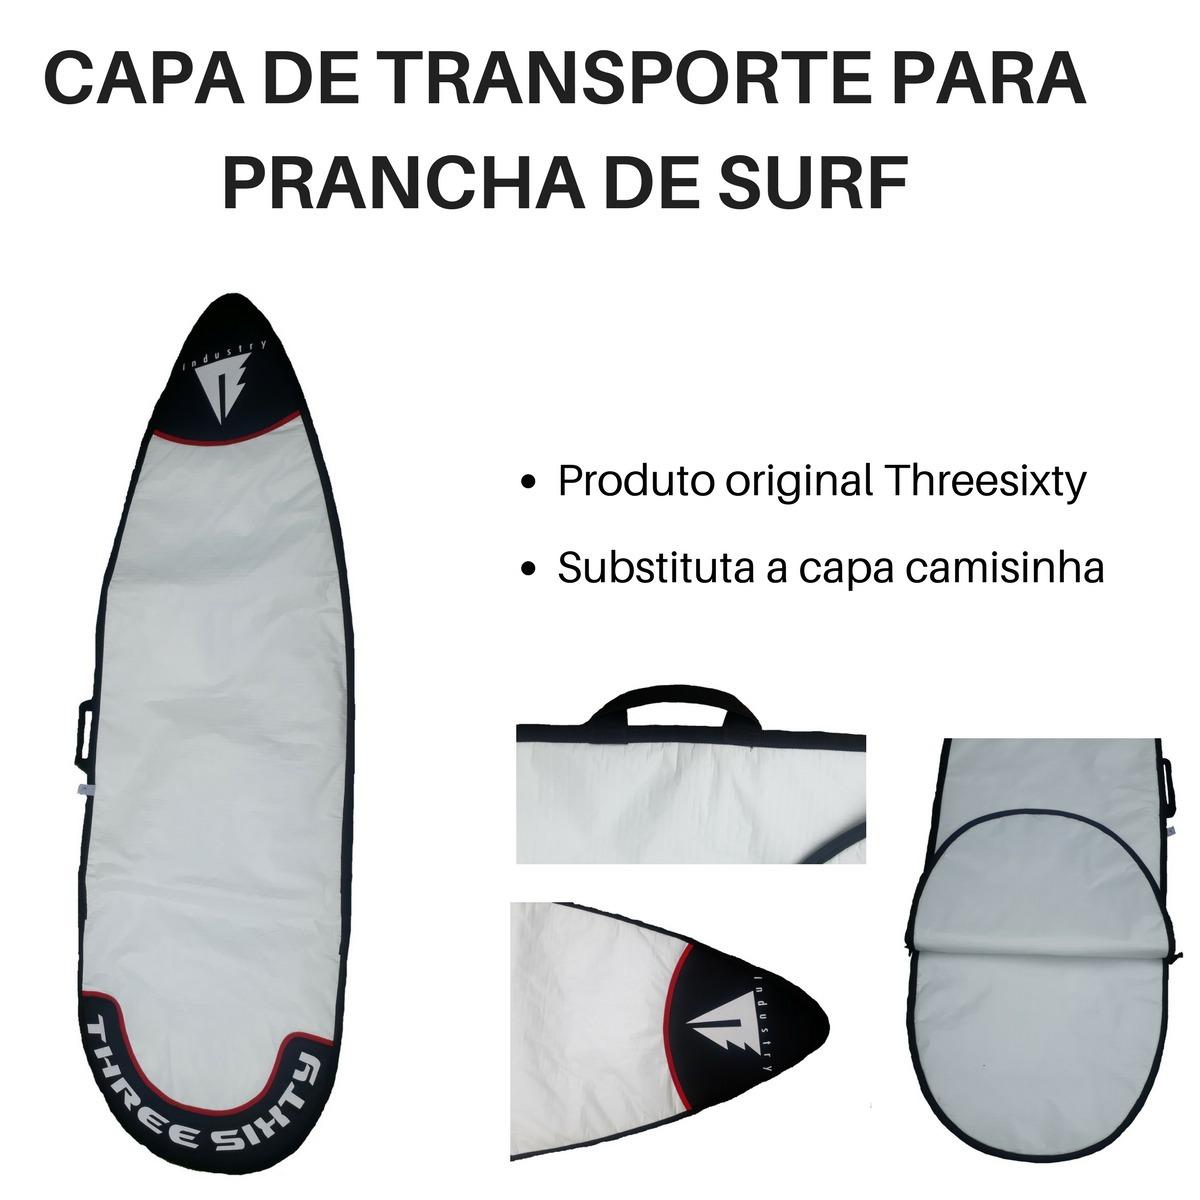 e678fa990 Capa De Prancha De Surf Barata Shortboard Capa Camisinha - R  119